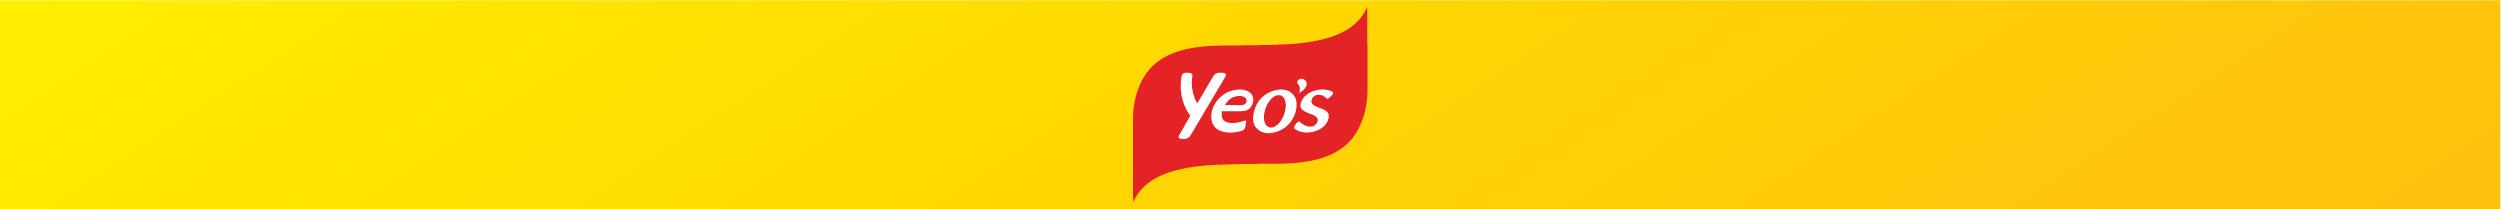 yeos_header